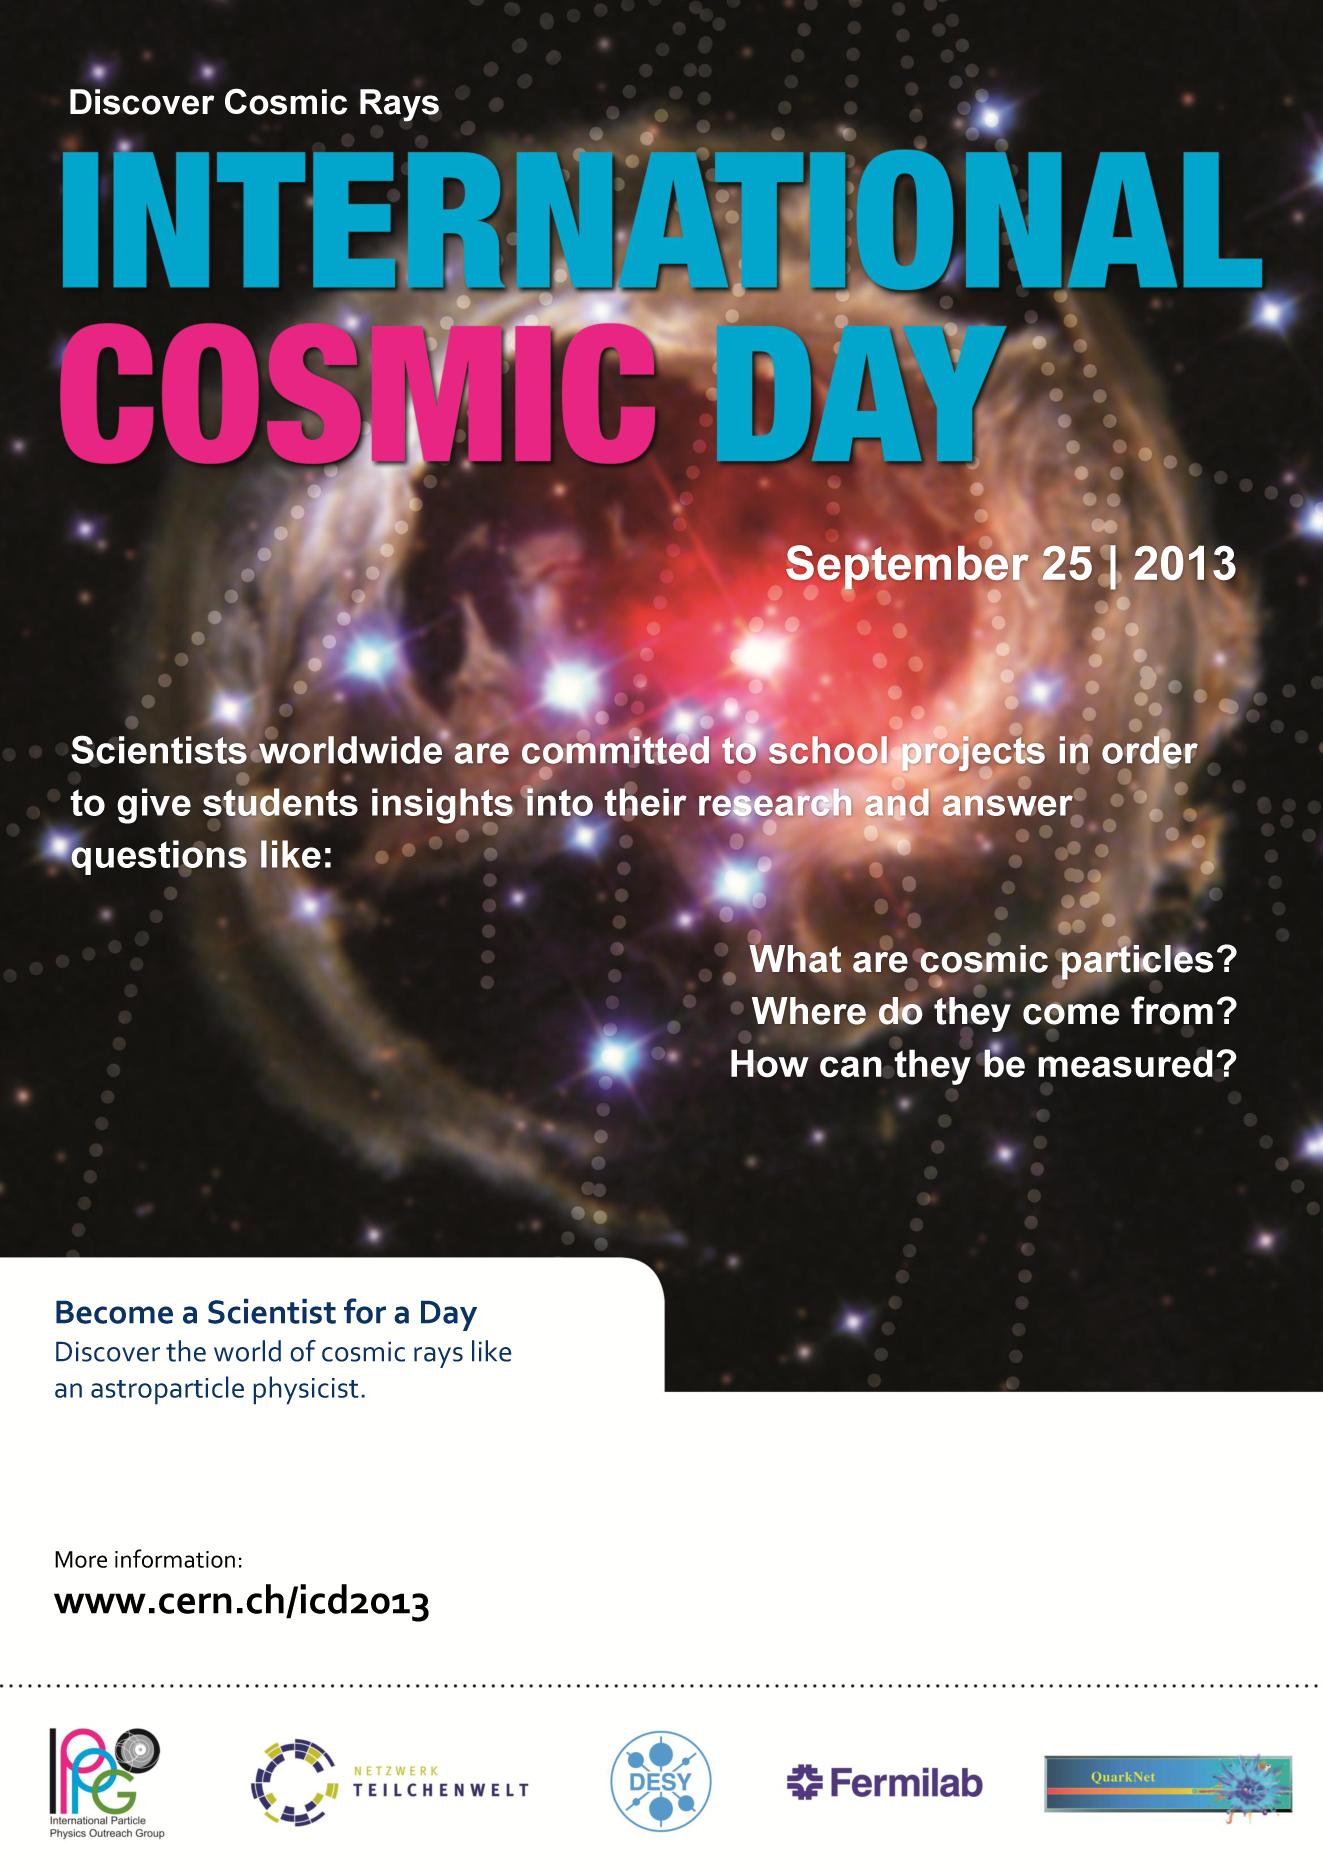 International Cosmic Day 2013